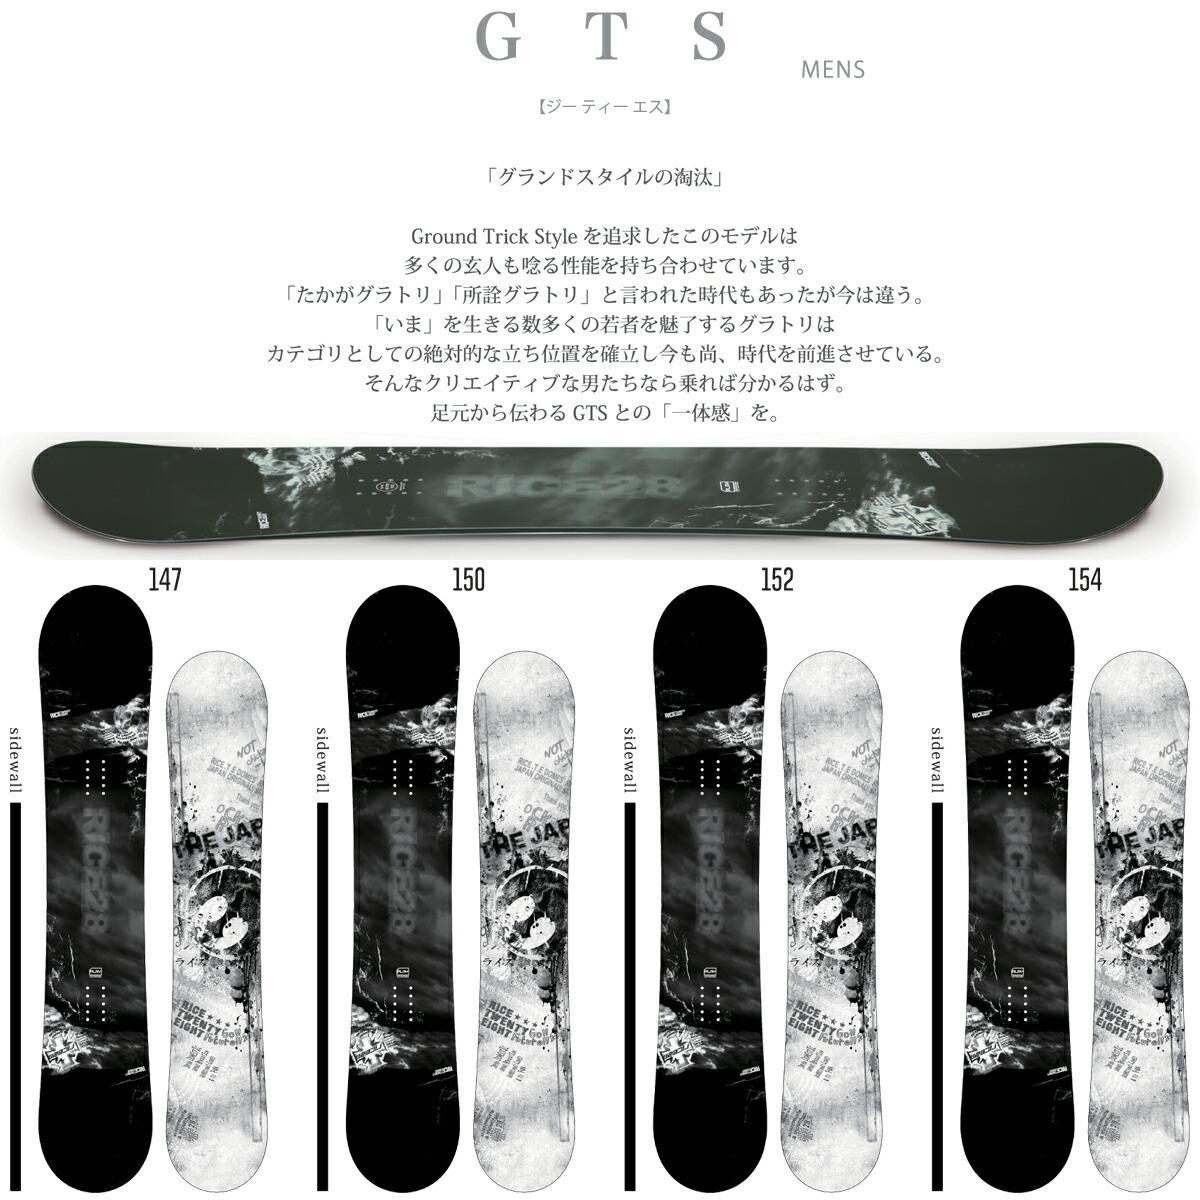 18-19 RICE28 GTS/18-19 ライス28 GTS/RICE28 18-19/RICE28 GTS 18 19/RICE28 ボード/ライス28 スノーボード/147/150/152/2018-2019